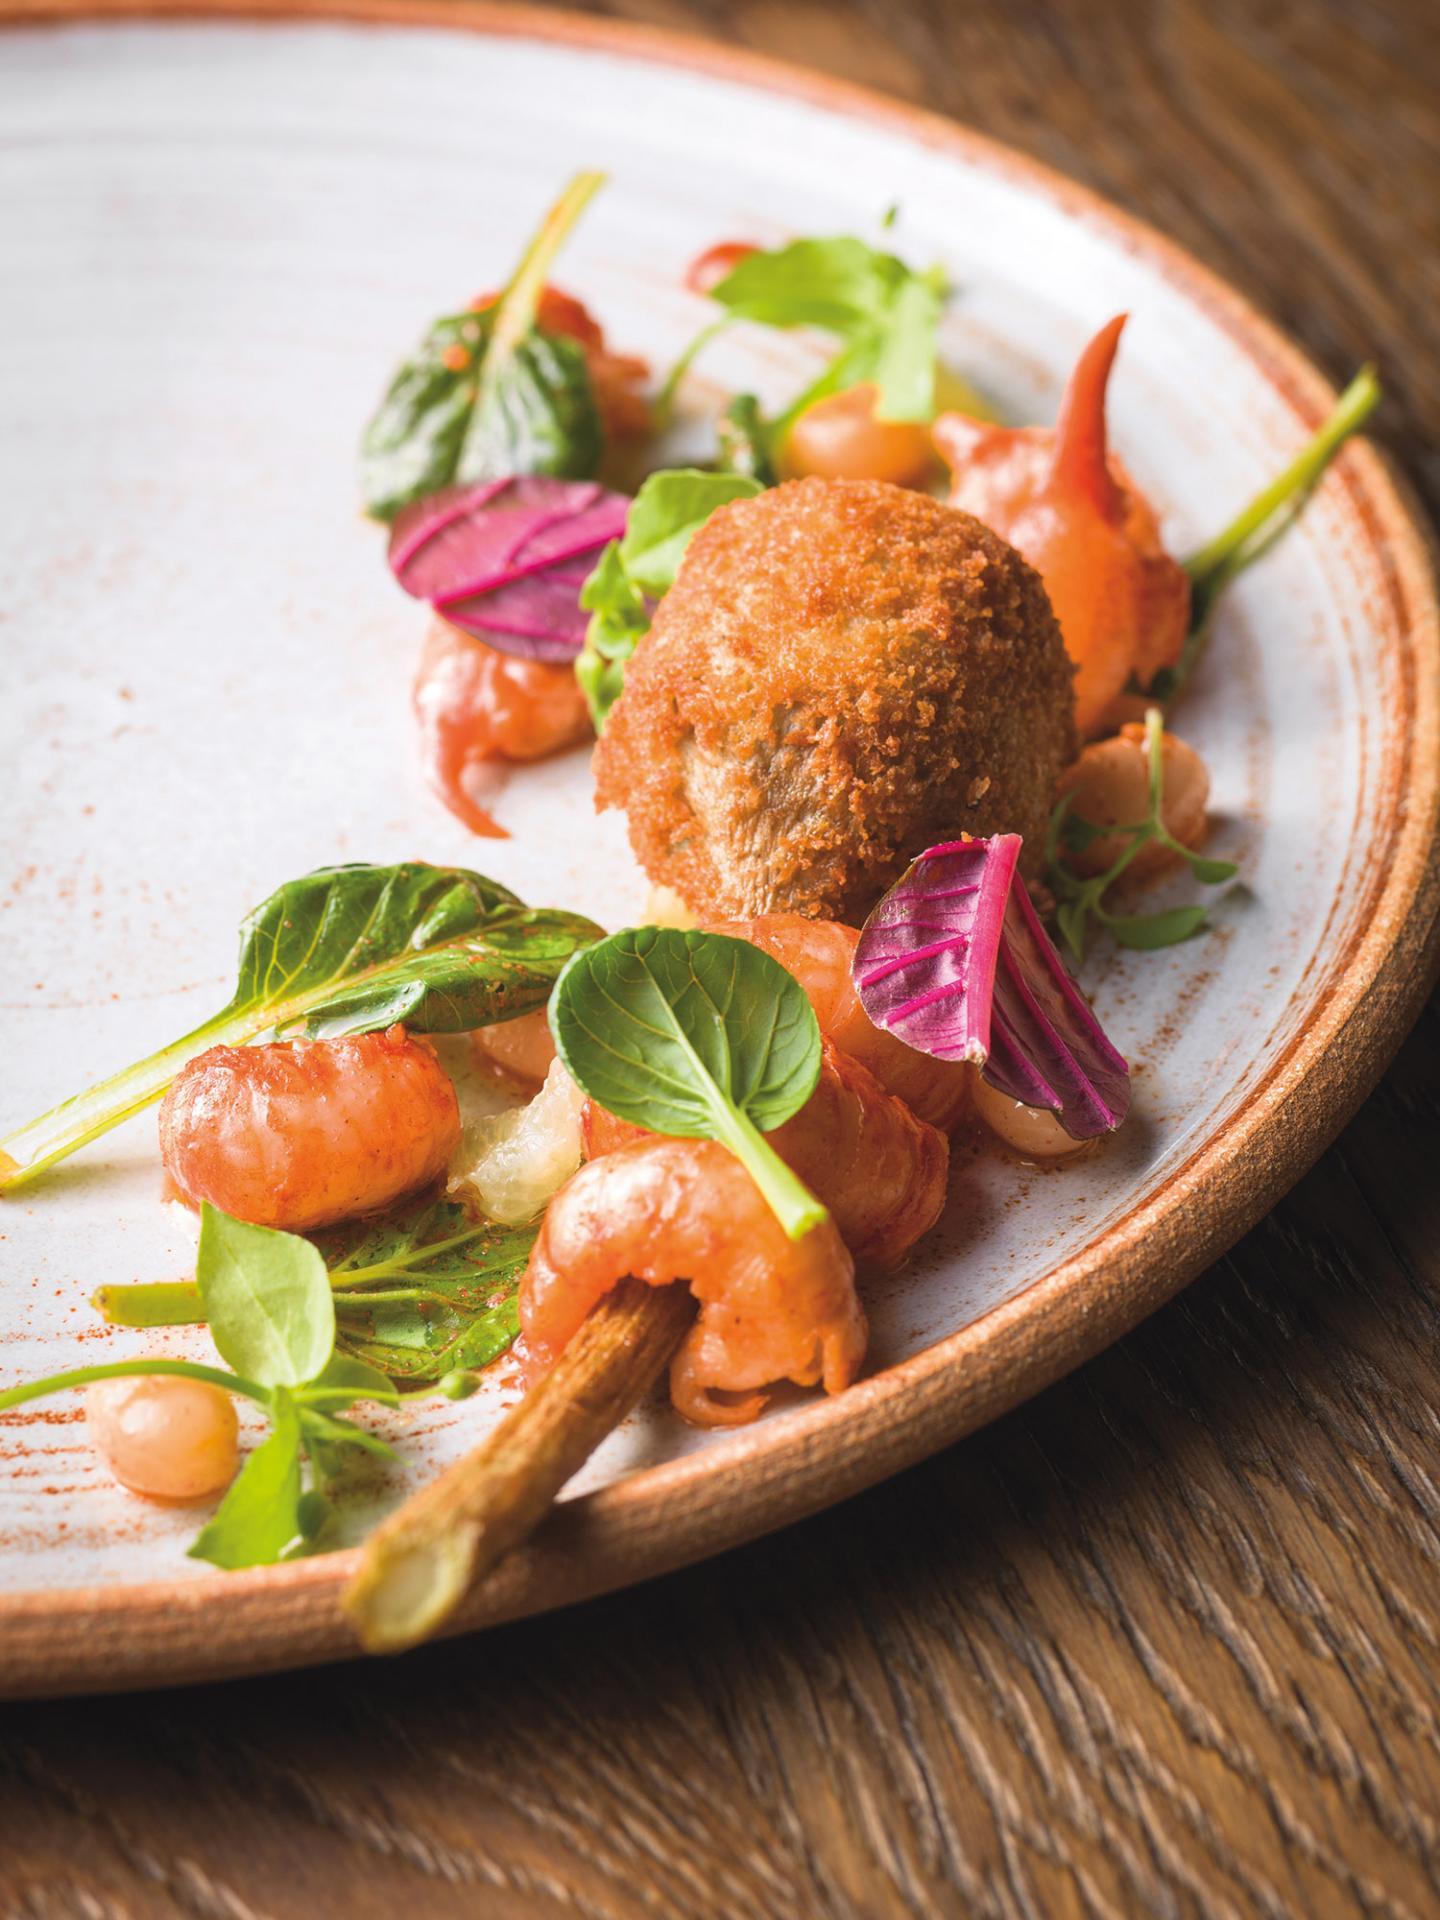 ©Arnaud Dauphin pour Arts & Gastronomie